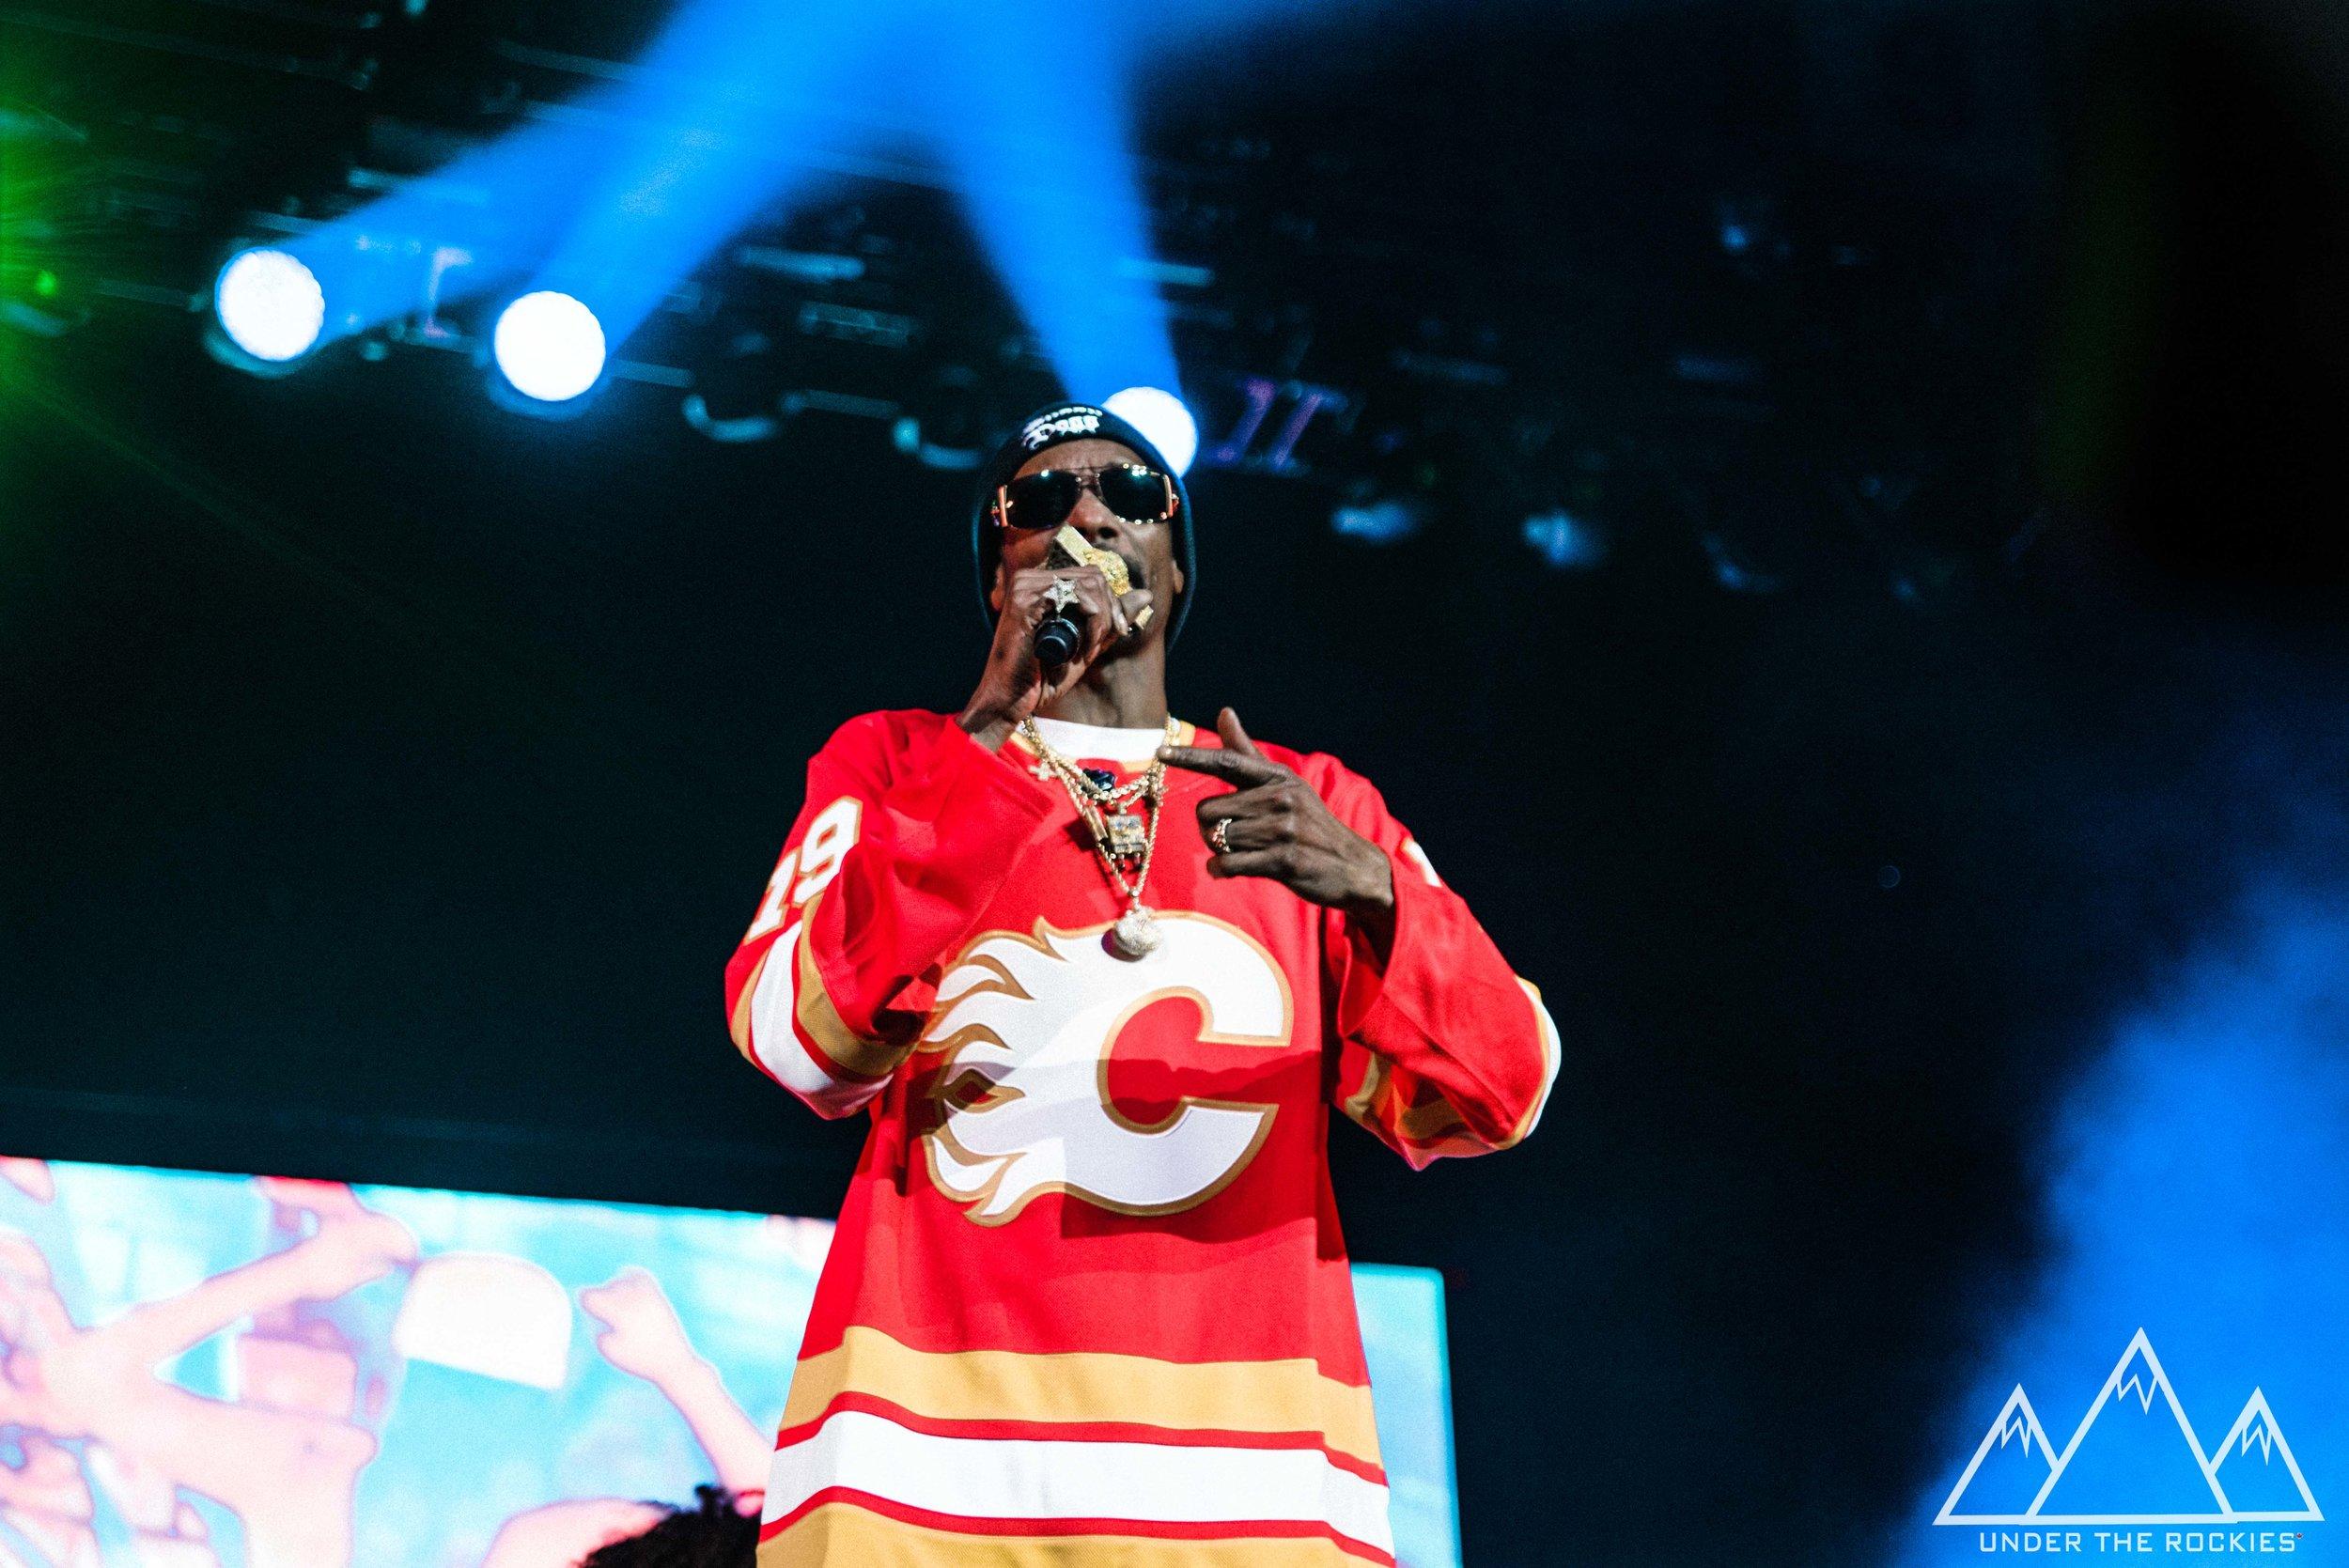 SnoopDogg-03-JJP-20190221.jpg